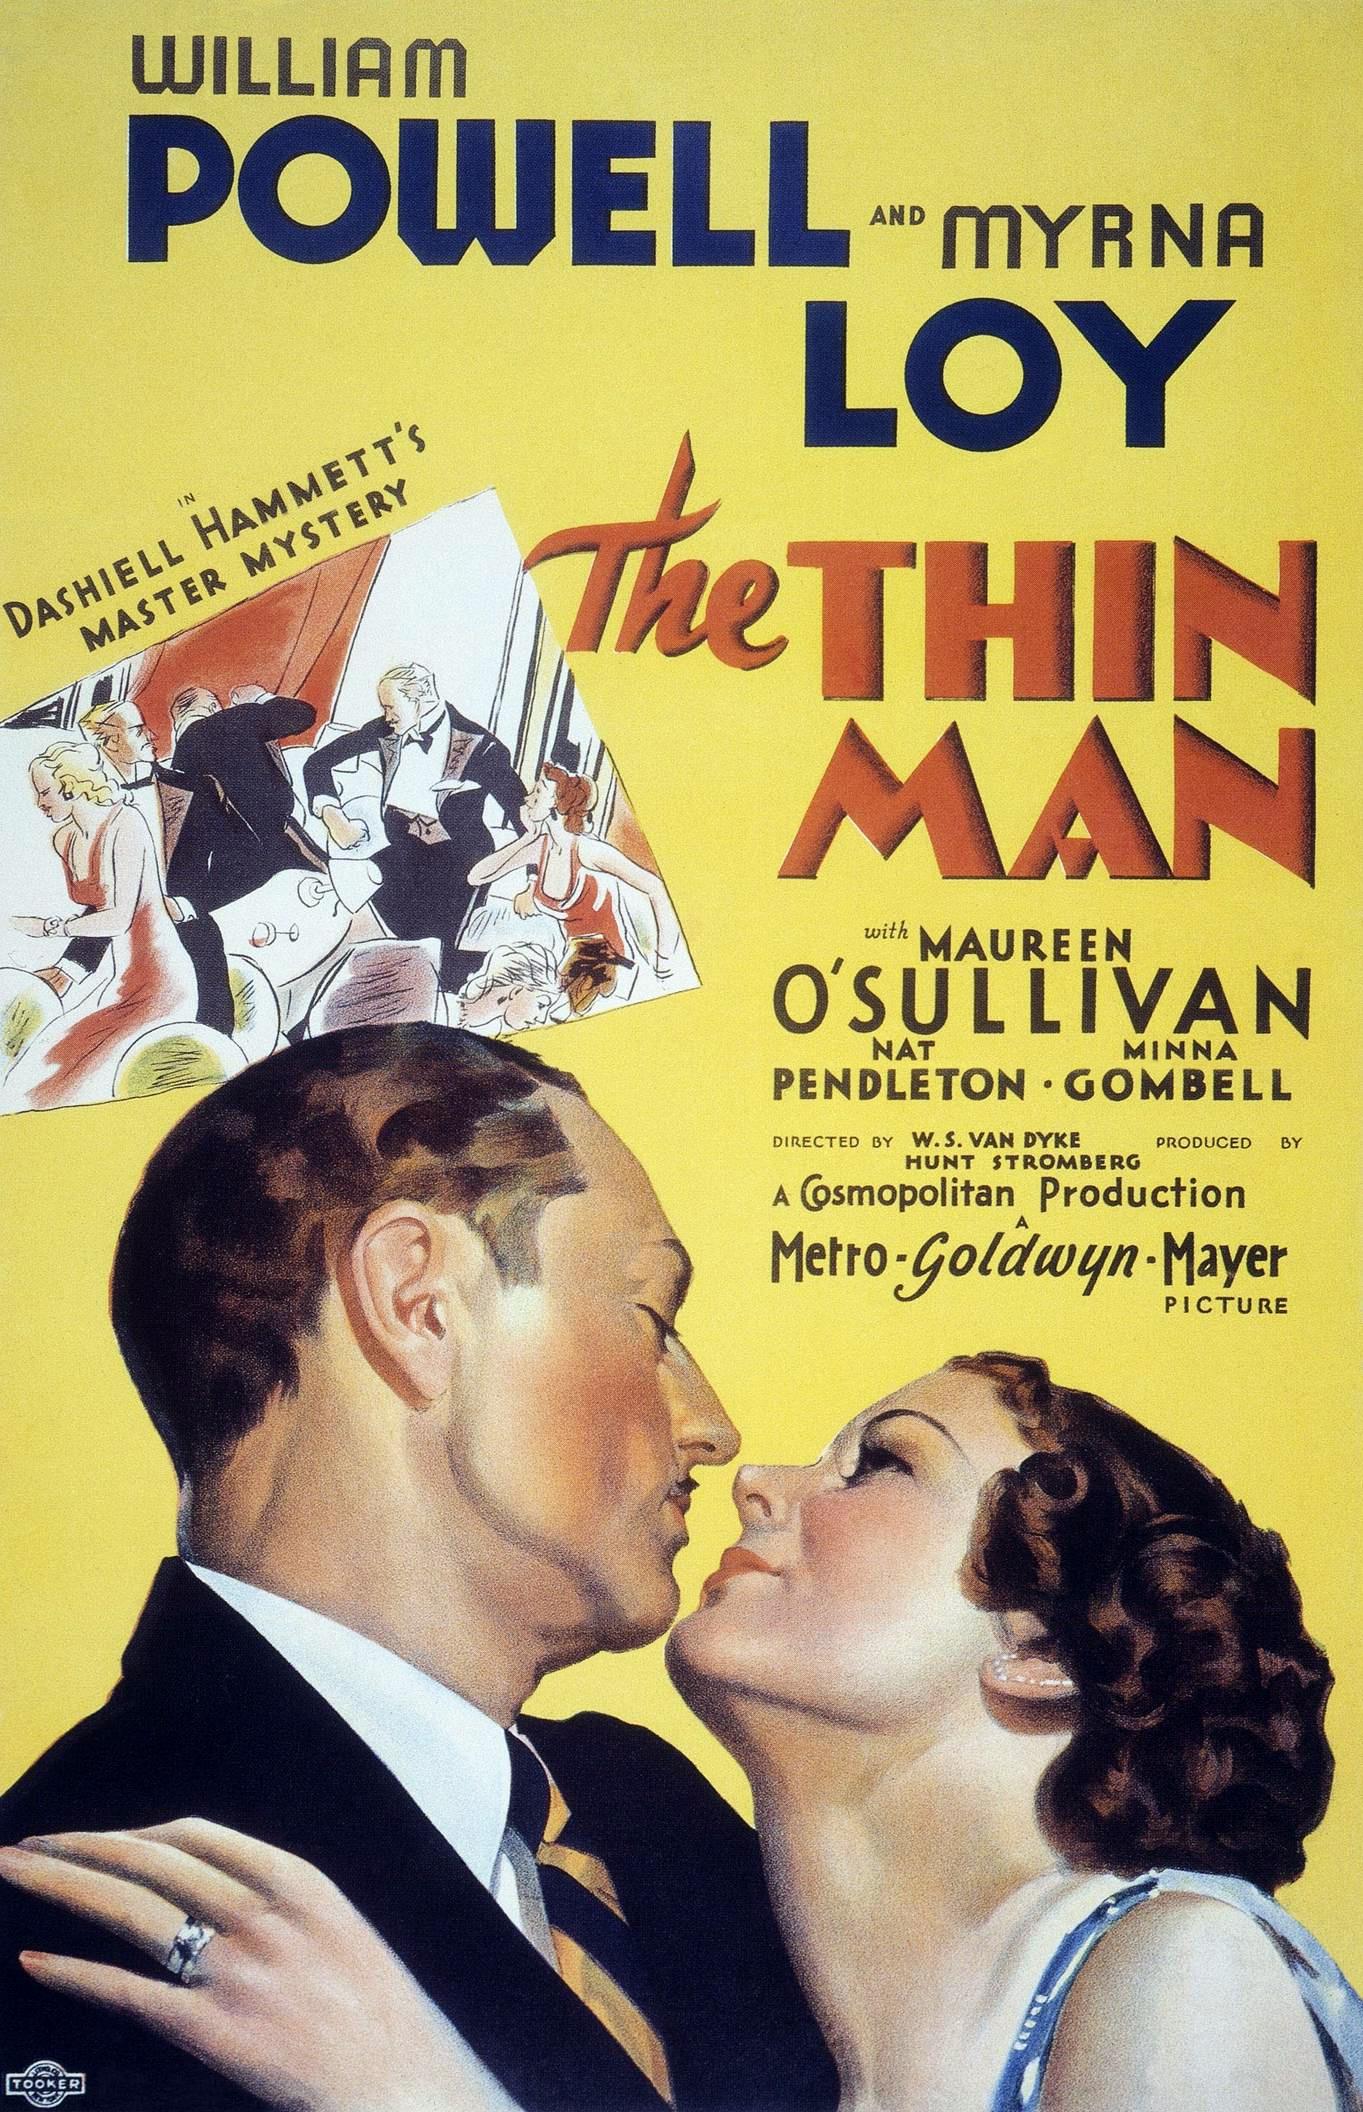 thin man Episode recap the thin man on tvcom watch the thin man episodes, get episode information, recaps and more.